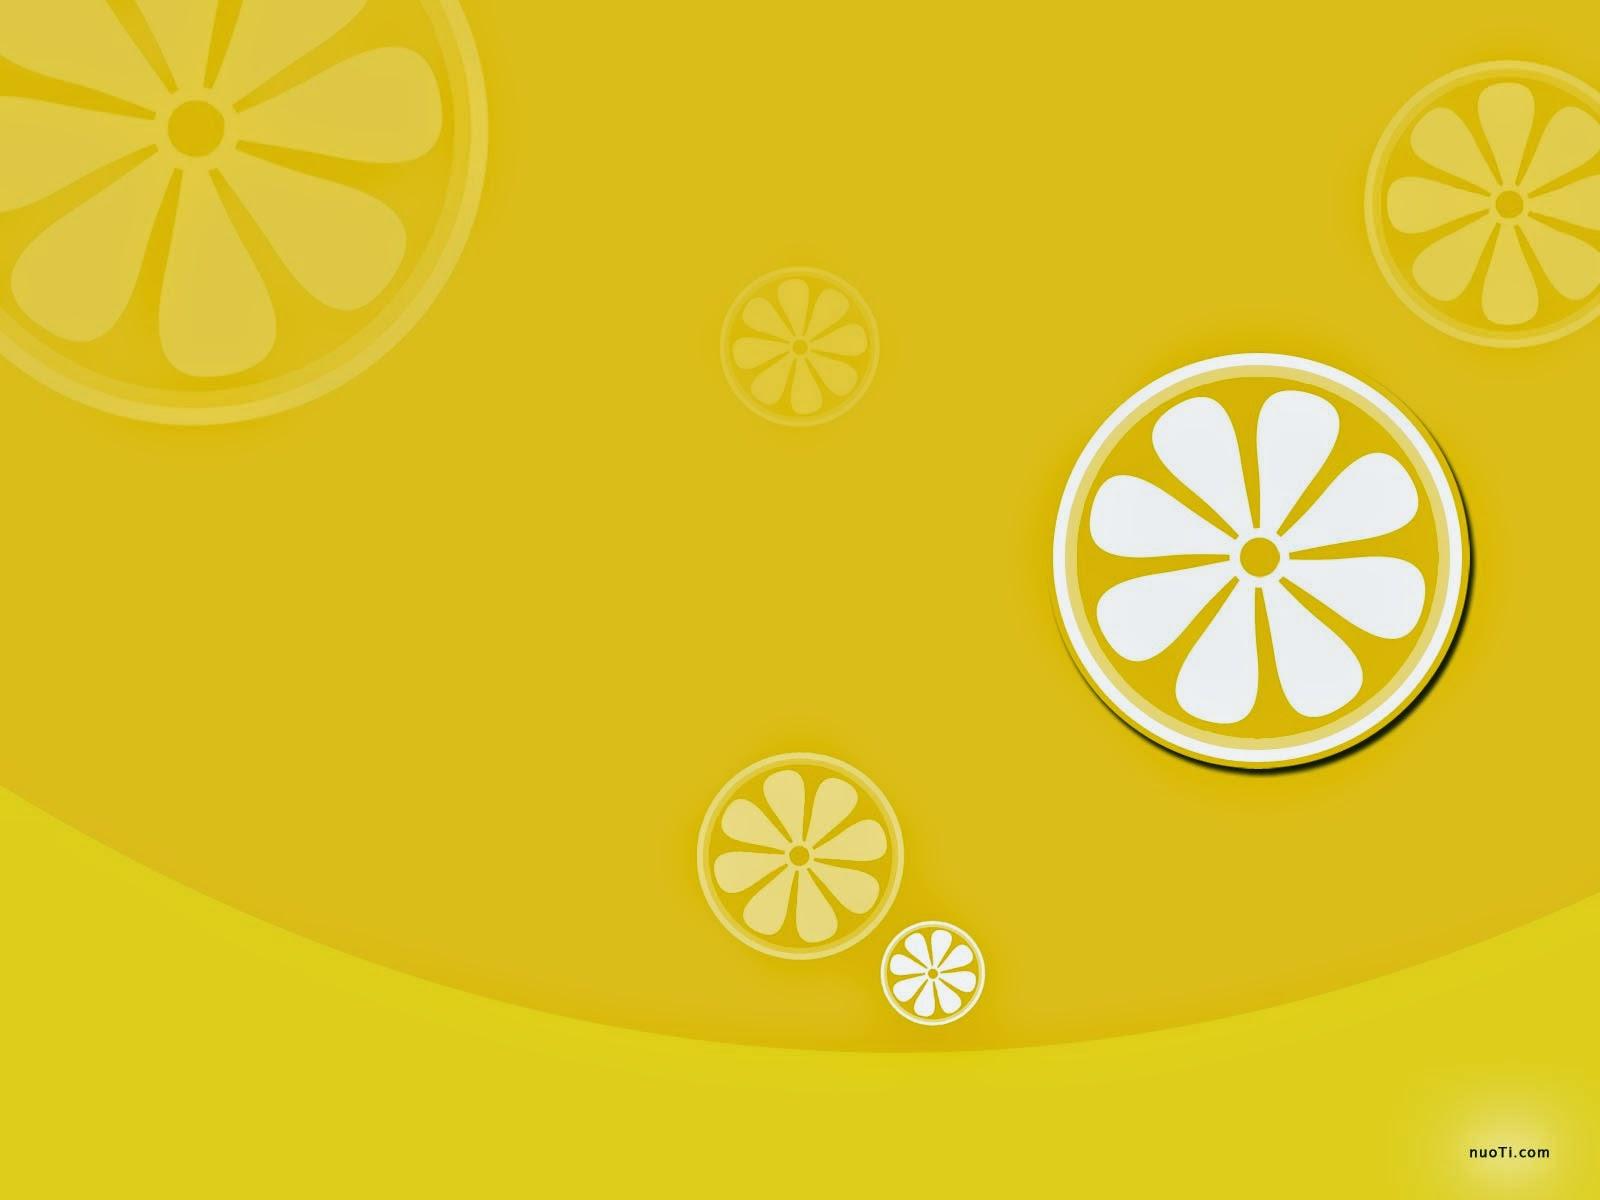 Download Yellow Wallpaper Summary Yellow Wallpaper Summary